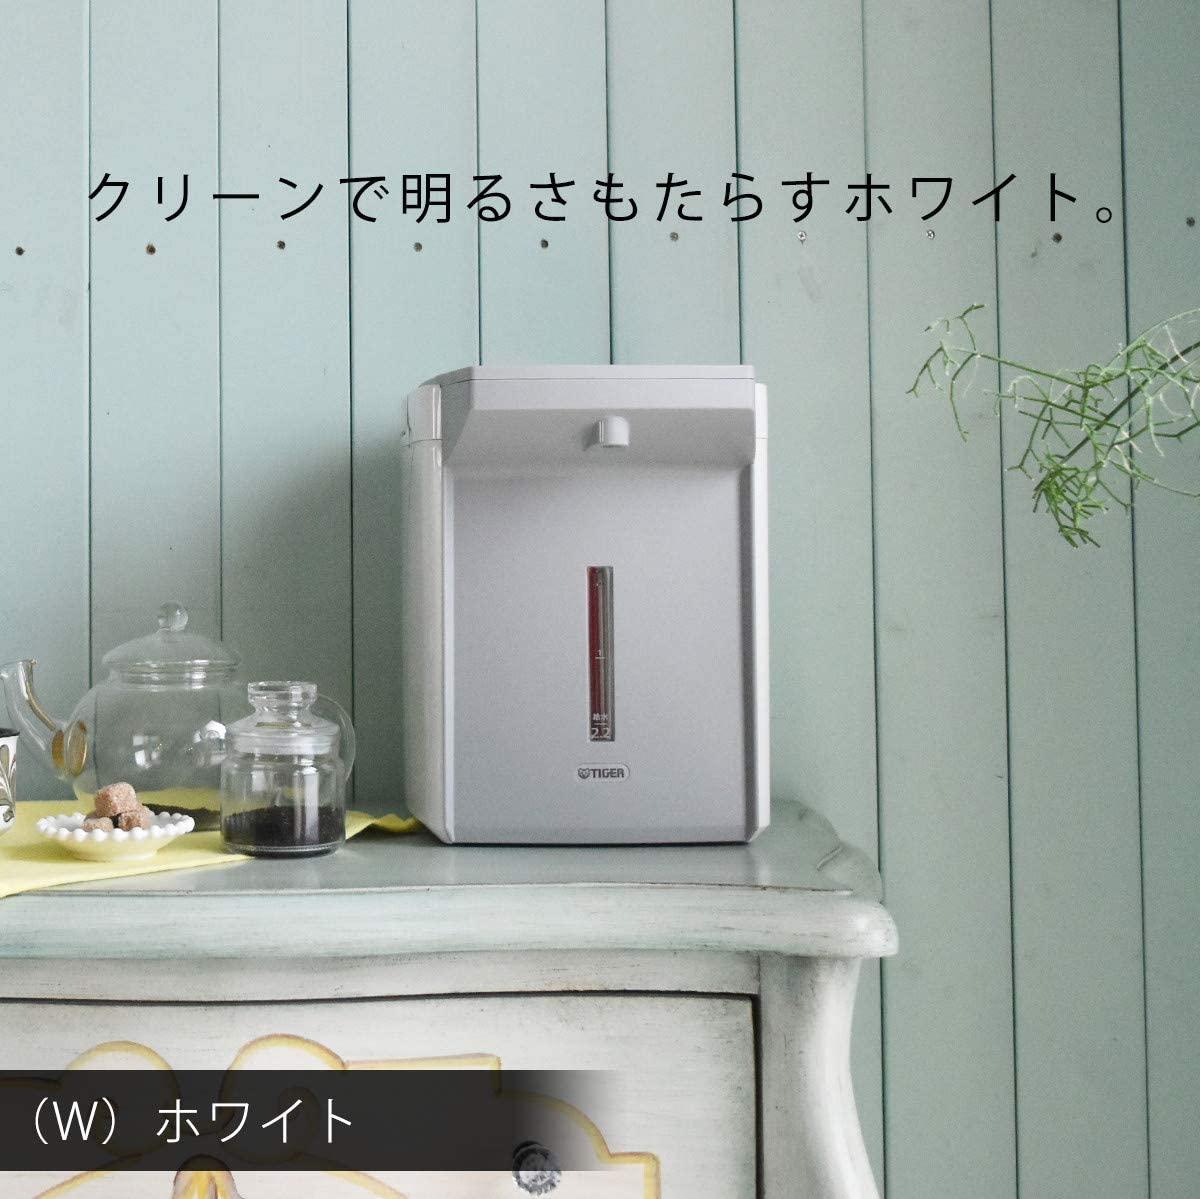 TIGER(タイガー)蒸気レスVE電気まほうびん PIJ-A220の商品画像8